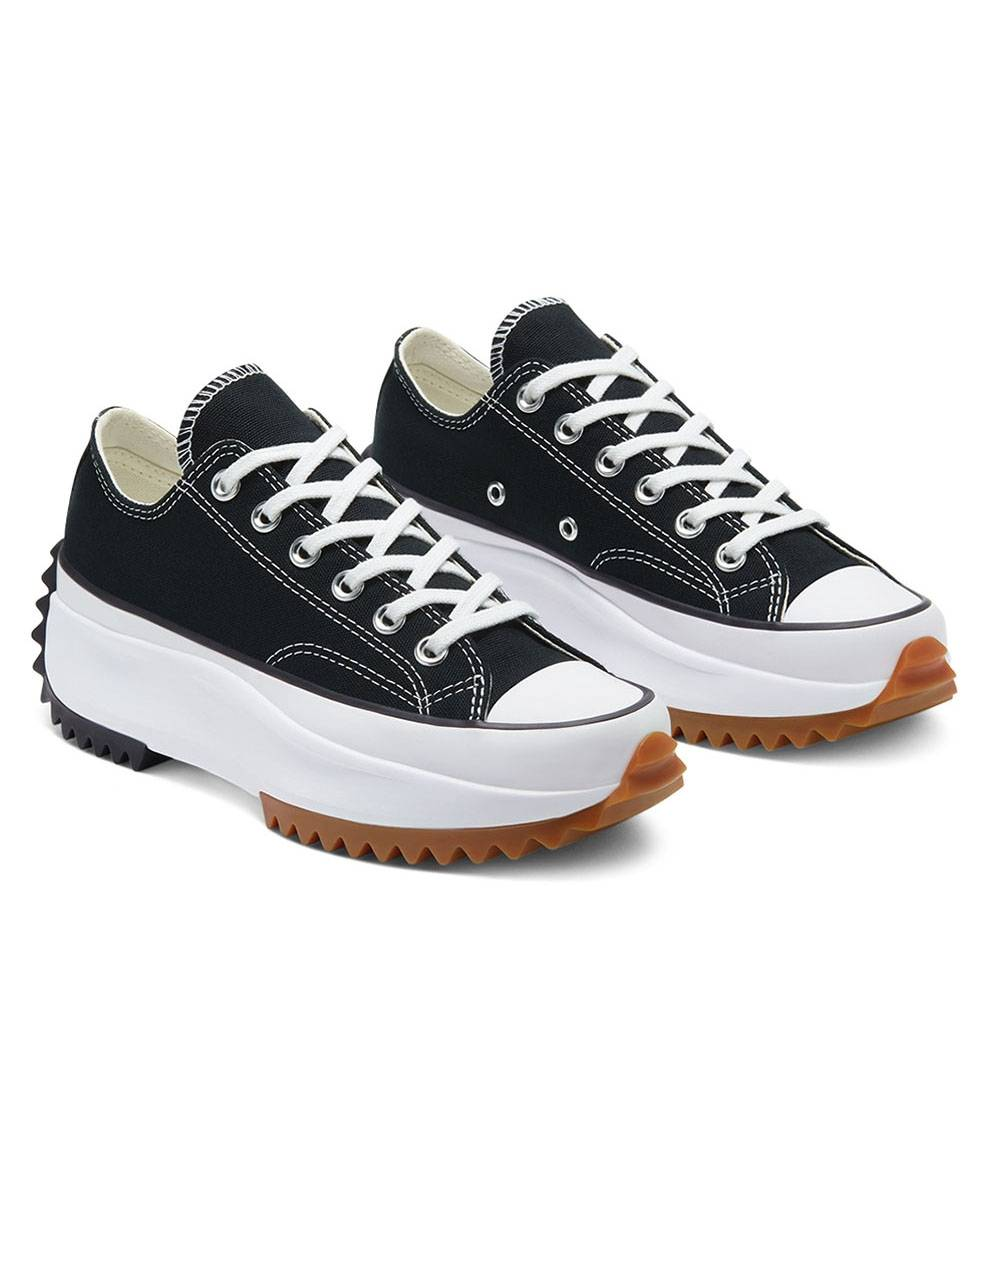 Converse Woman Run Star Hike low - black/white/gum Converse Sneakers 89,34€